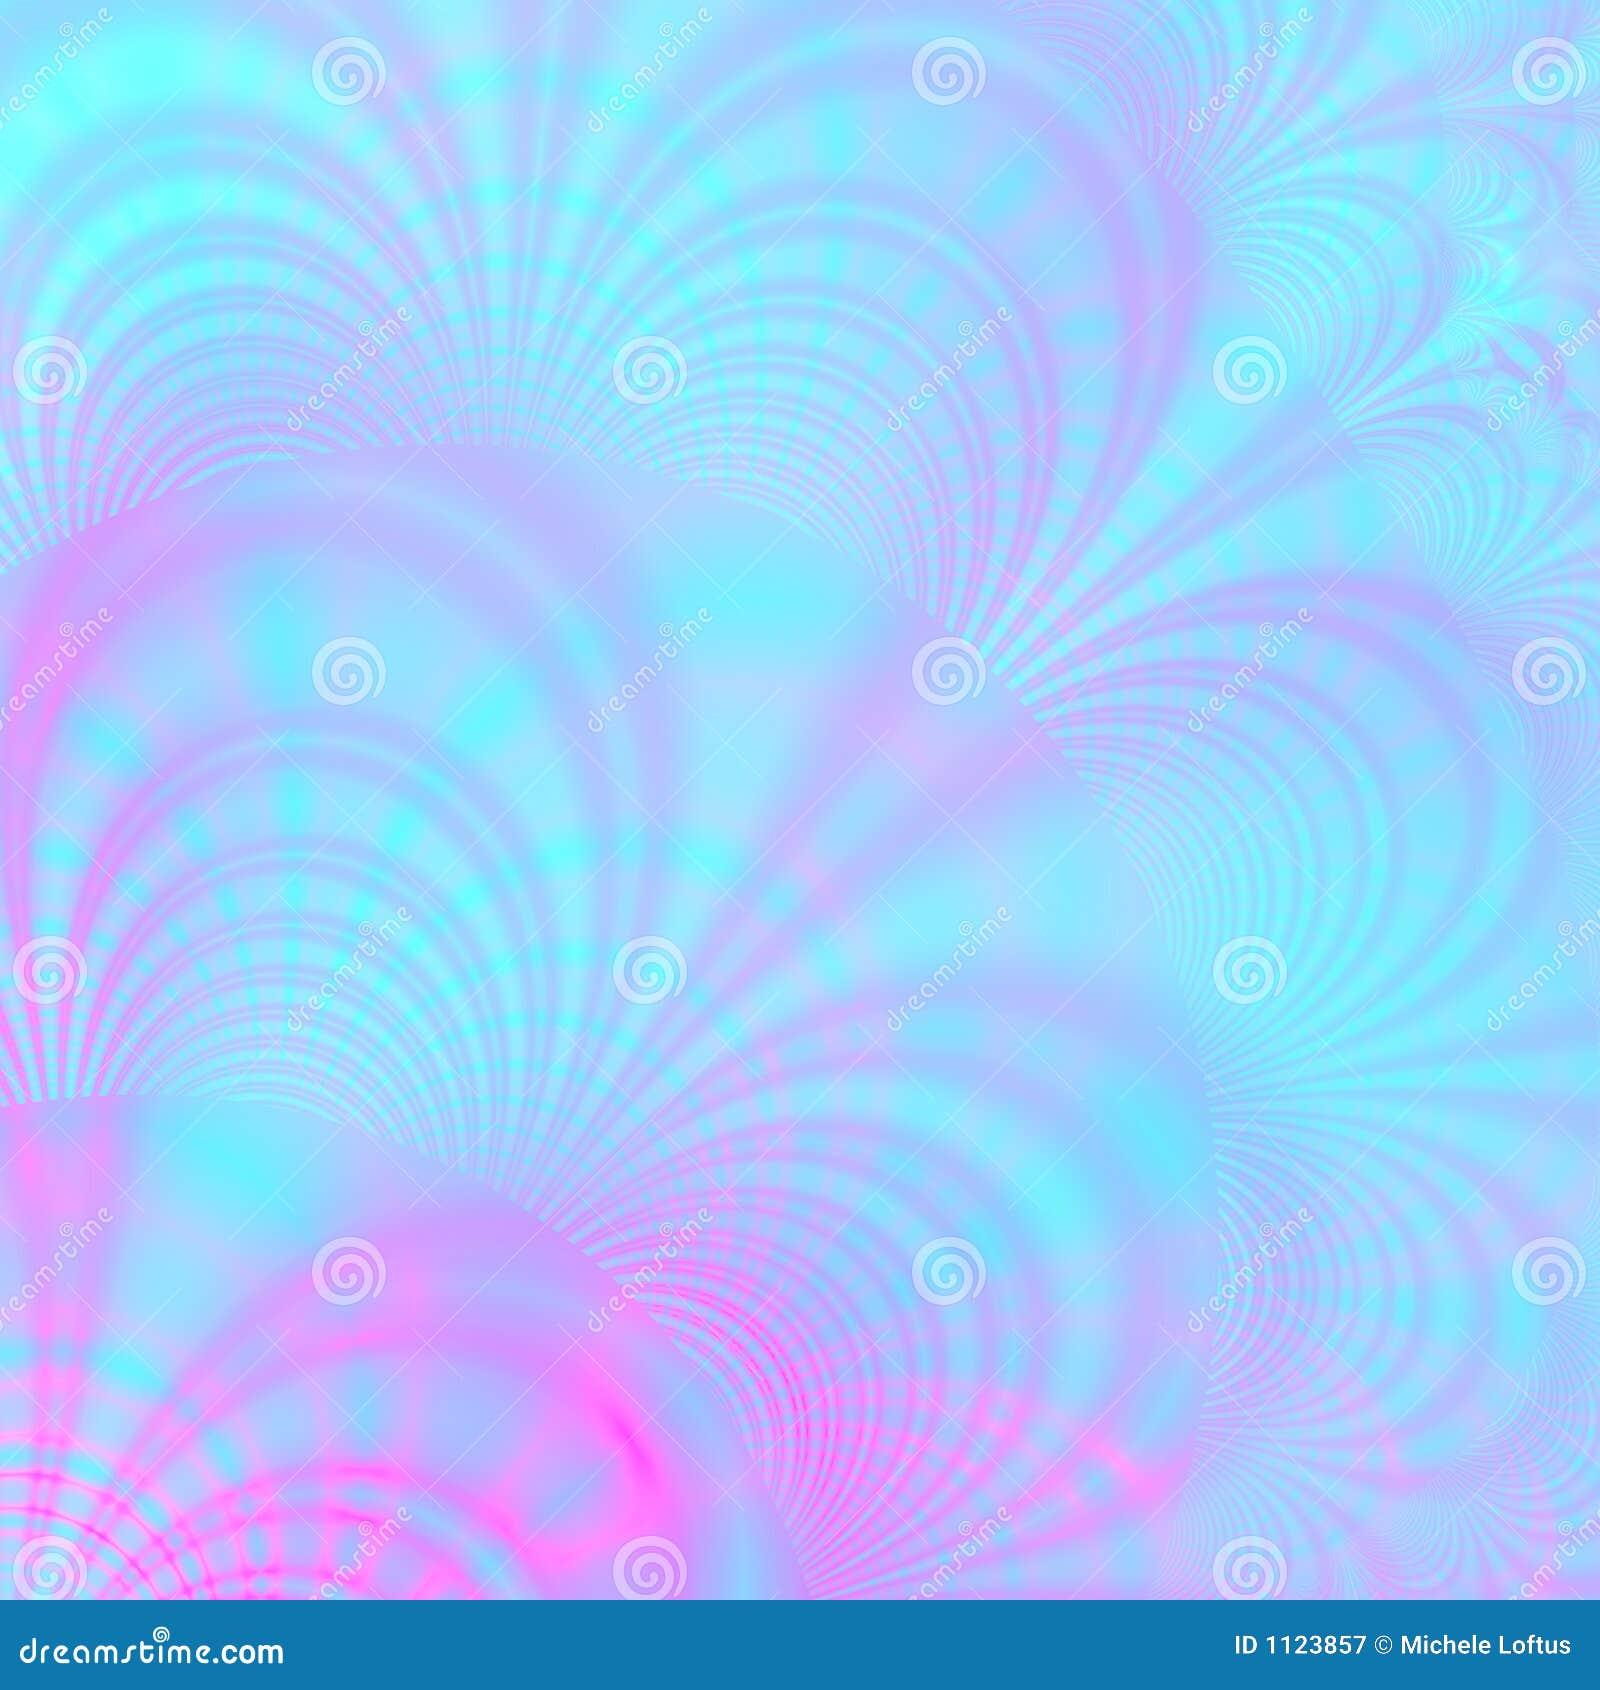 cool purple wallpaper